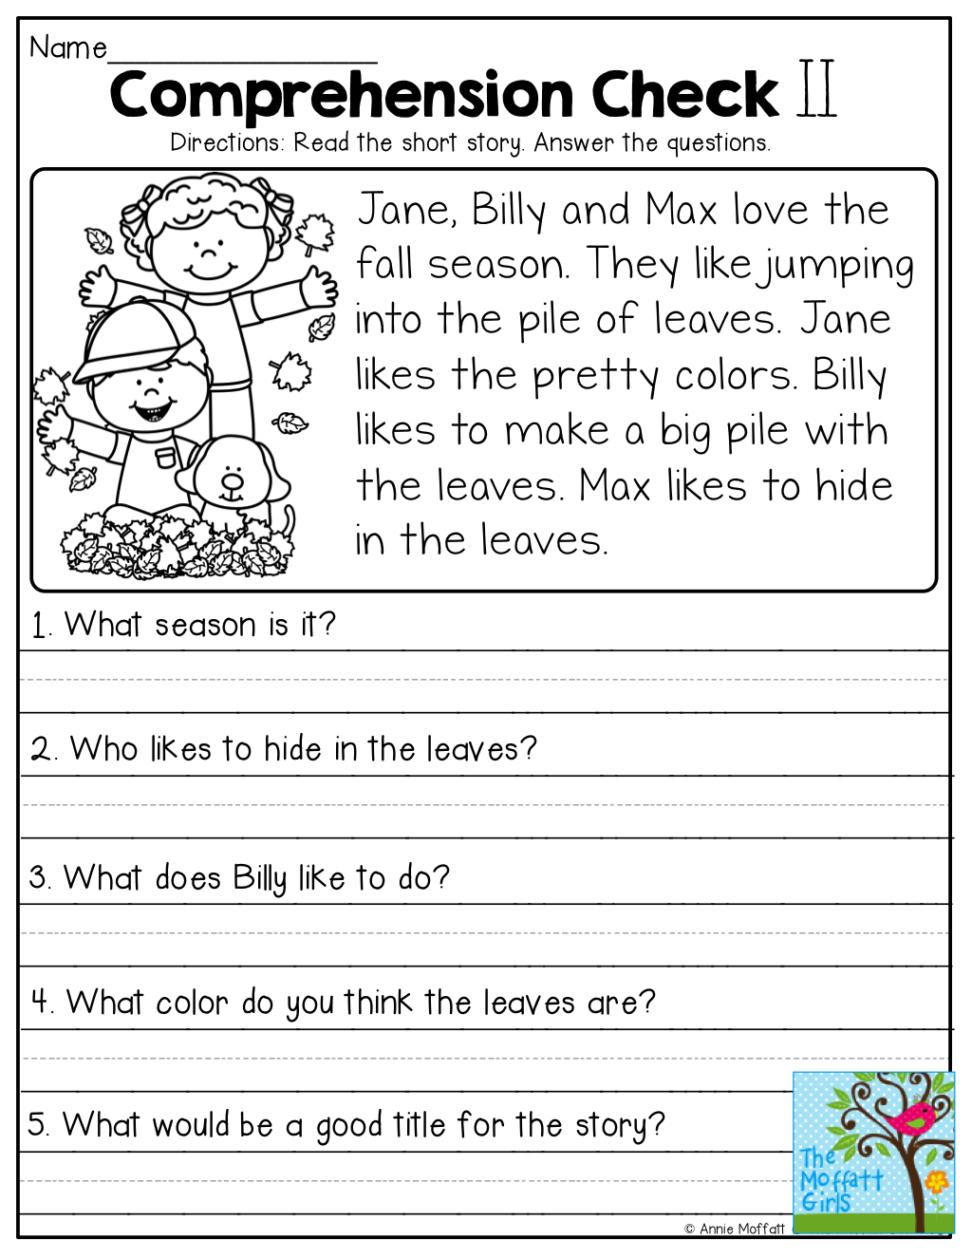 Worksheet. Free Printable Reading Comprehension Worksheets - Free | Printable Reading Worksheets